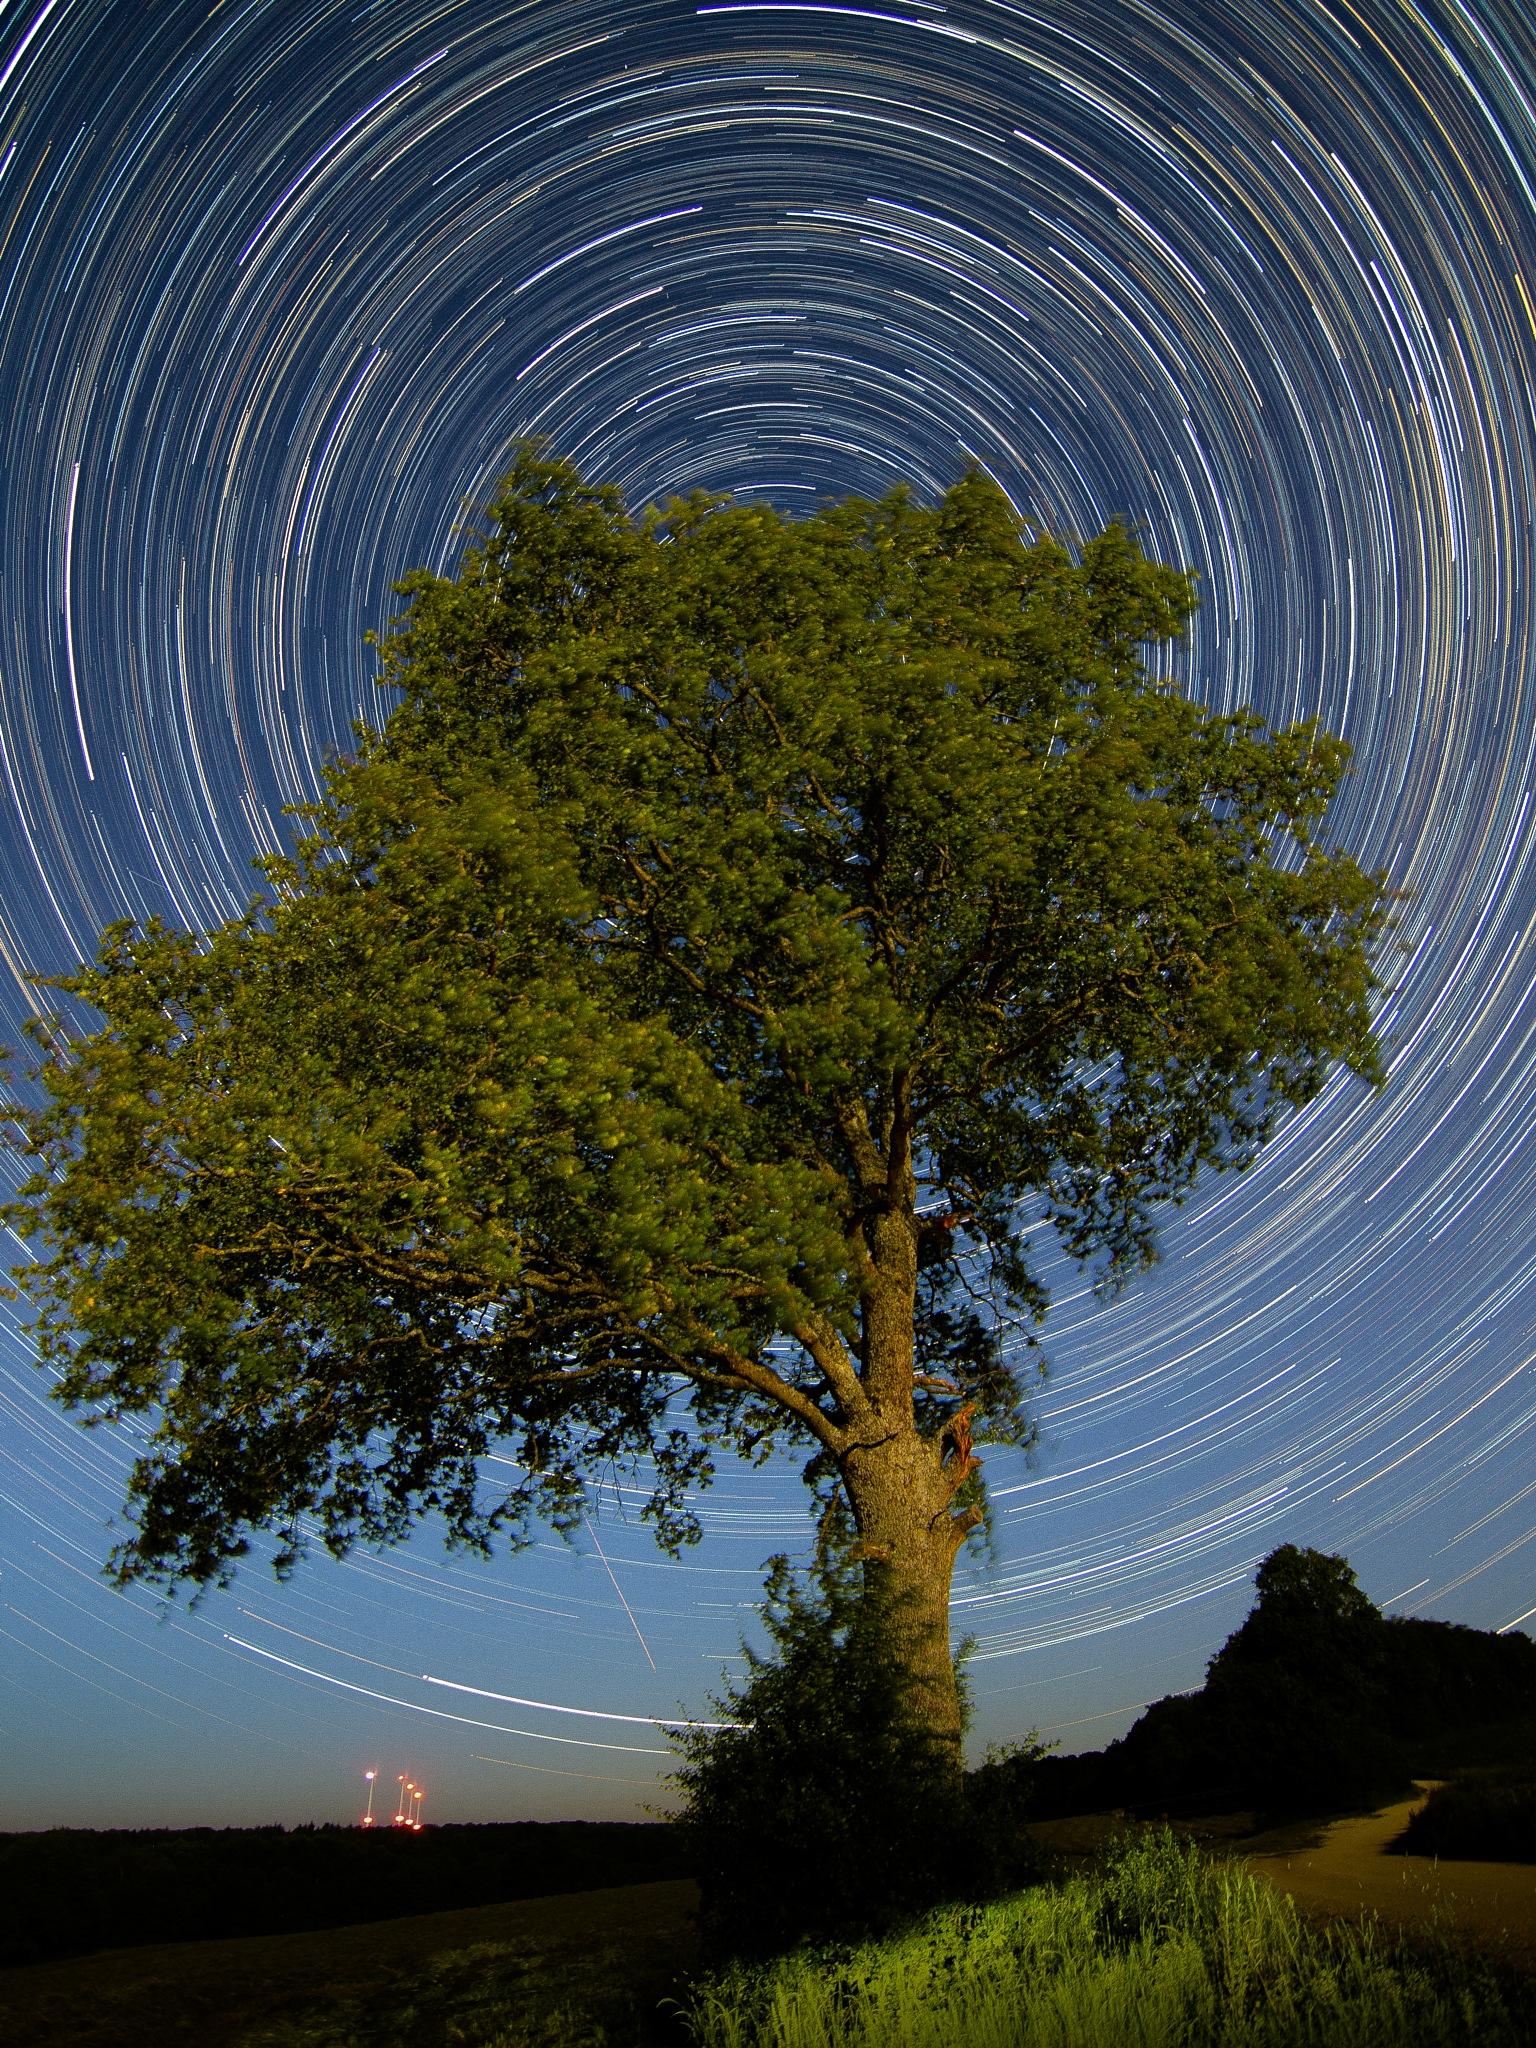 Leaves Of Stars by Darblanc